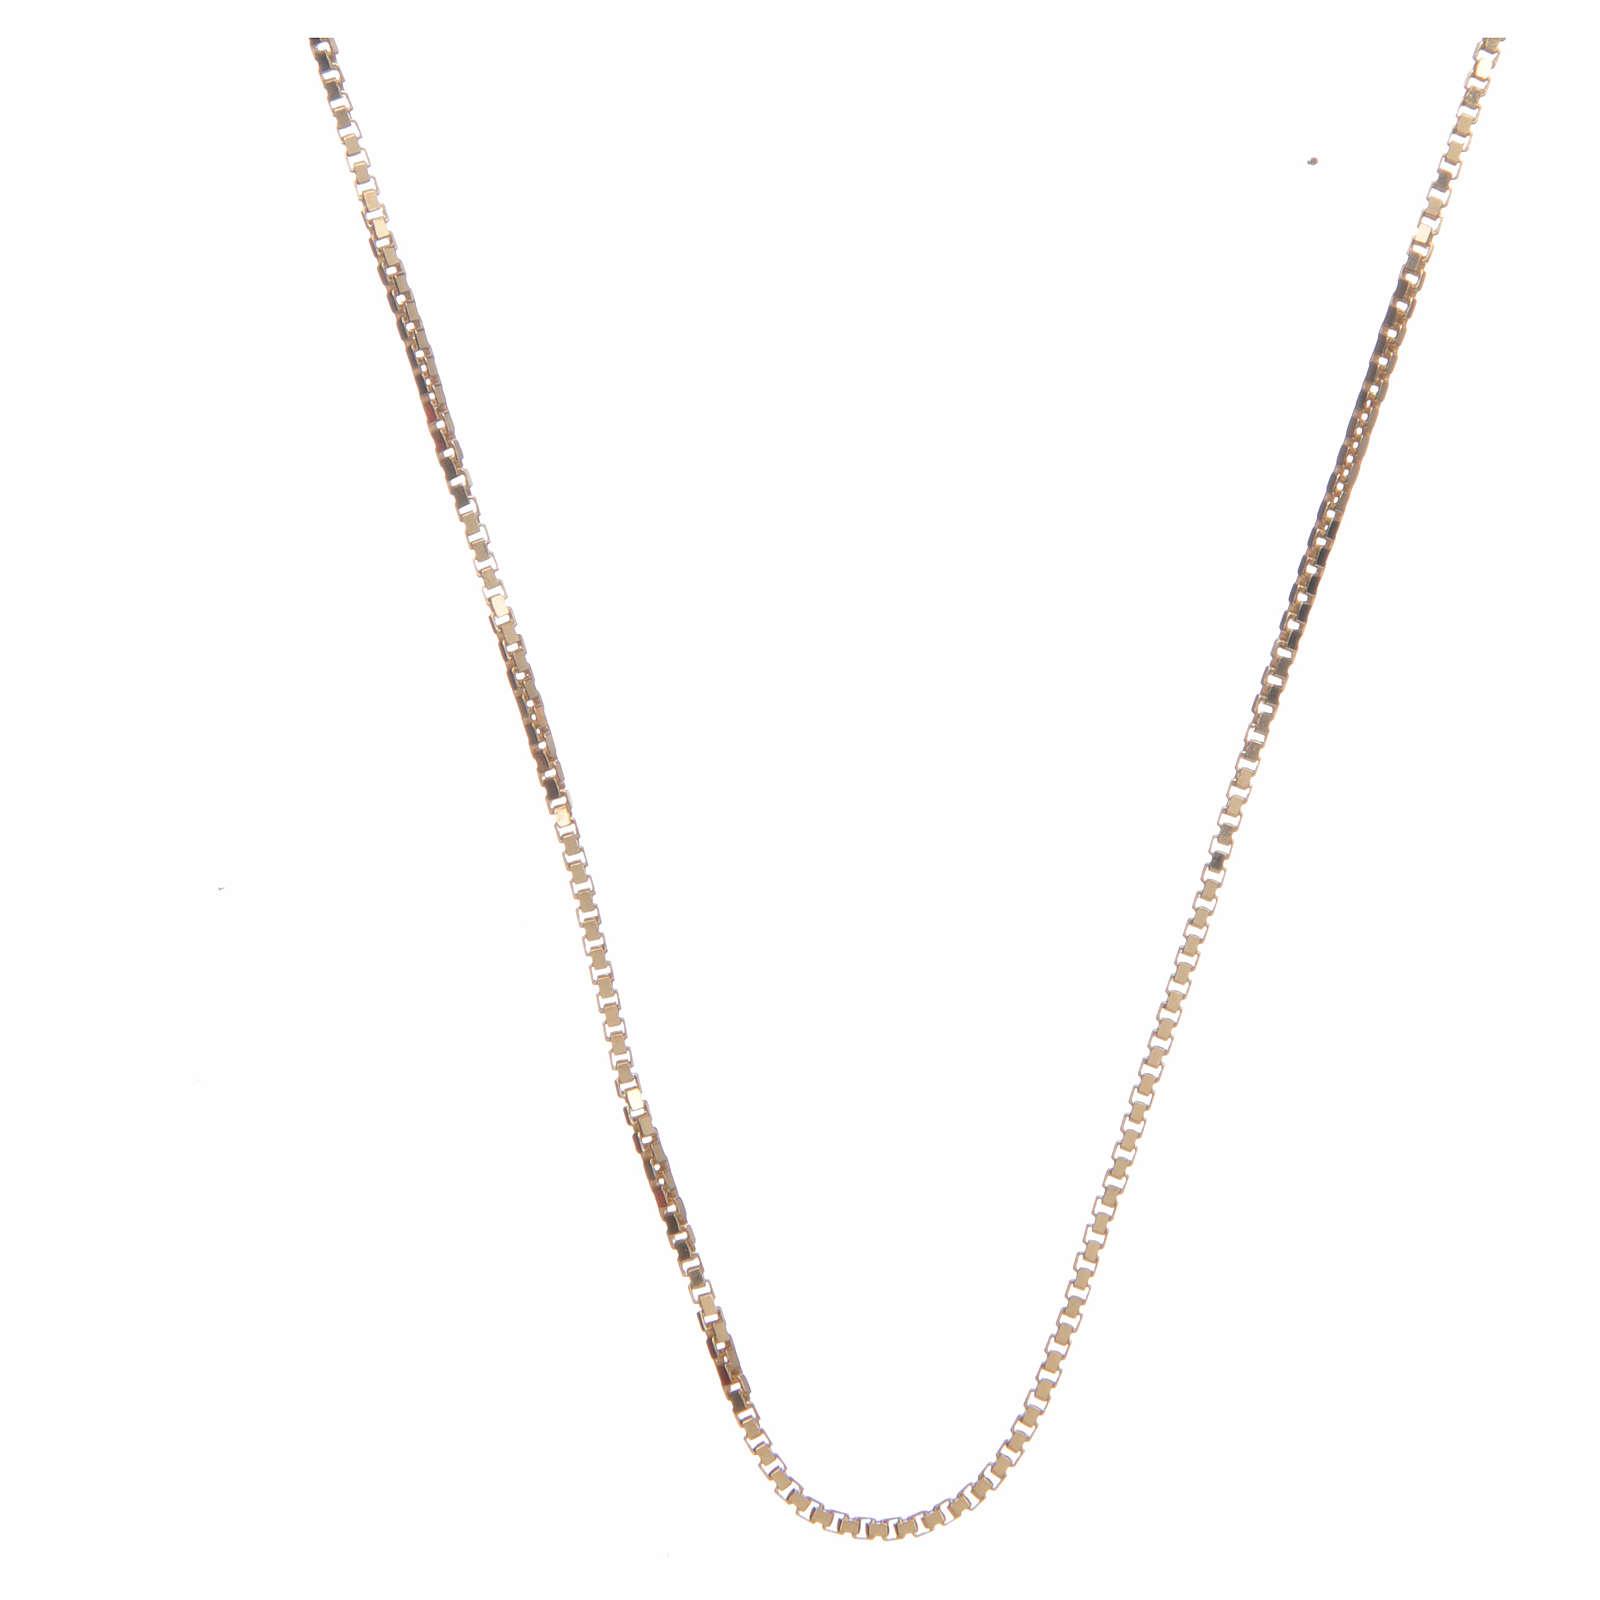 Catena veneta argento 925 dorato 65 cm 4